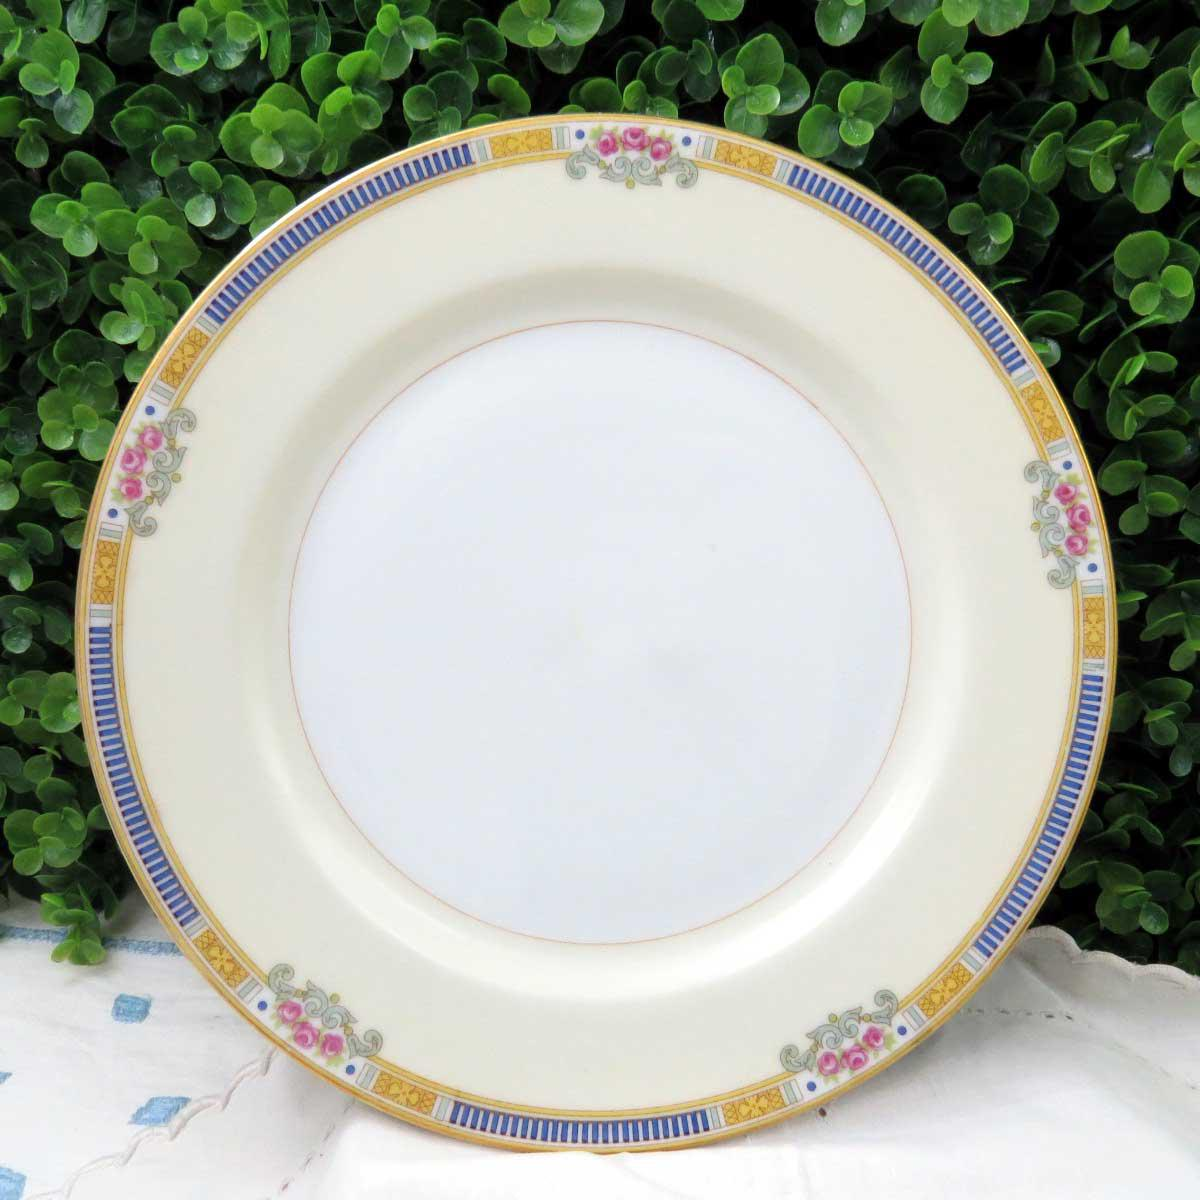 Vintage Mismatched Fine China Dinner Plates - Set of 4 - Image 4 of 11 & Vintage Mismatched Fine China Dinner Plates - Set of 4 | Chairish